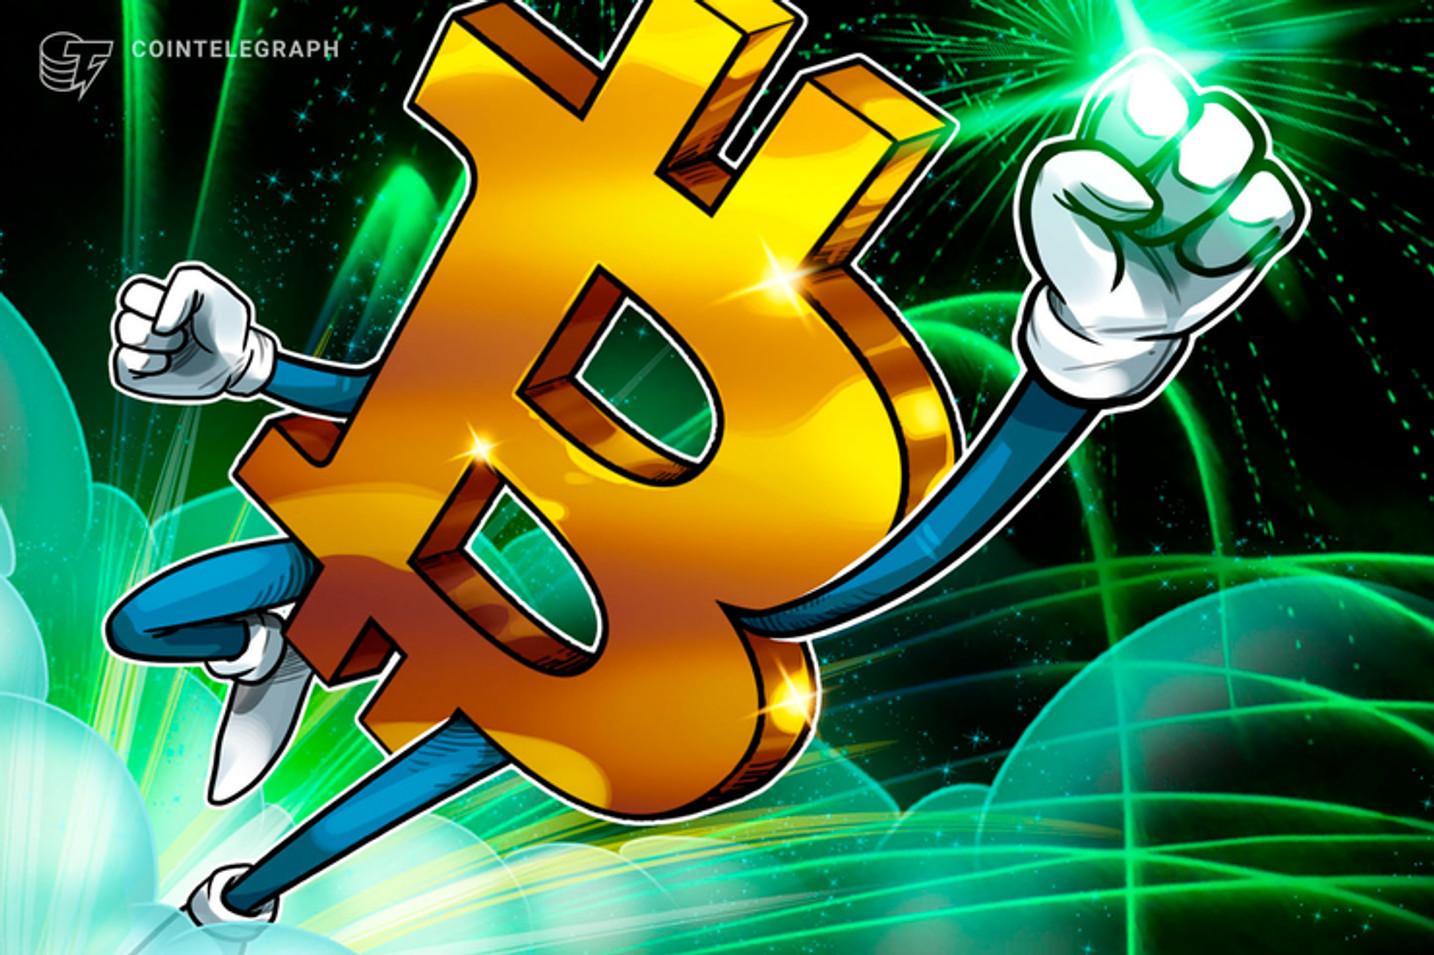 Diante de grave crise cambial, argentinos se refugiam no Bitcoin para manter poder de compra